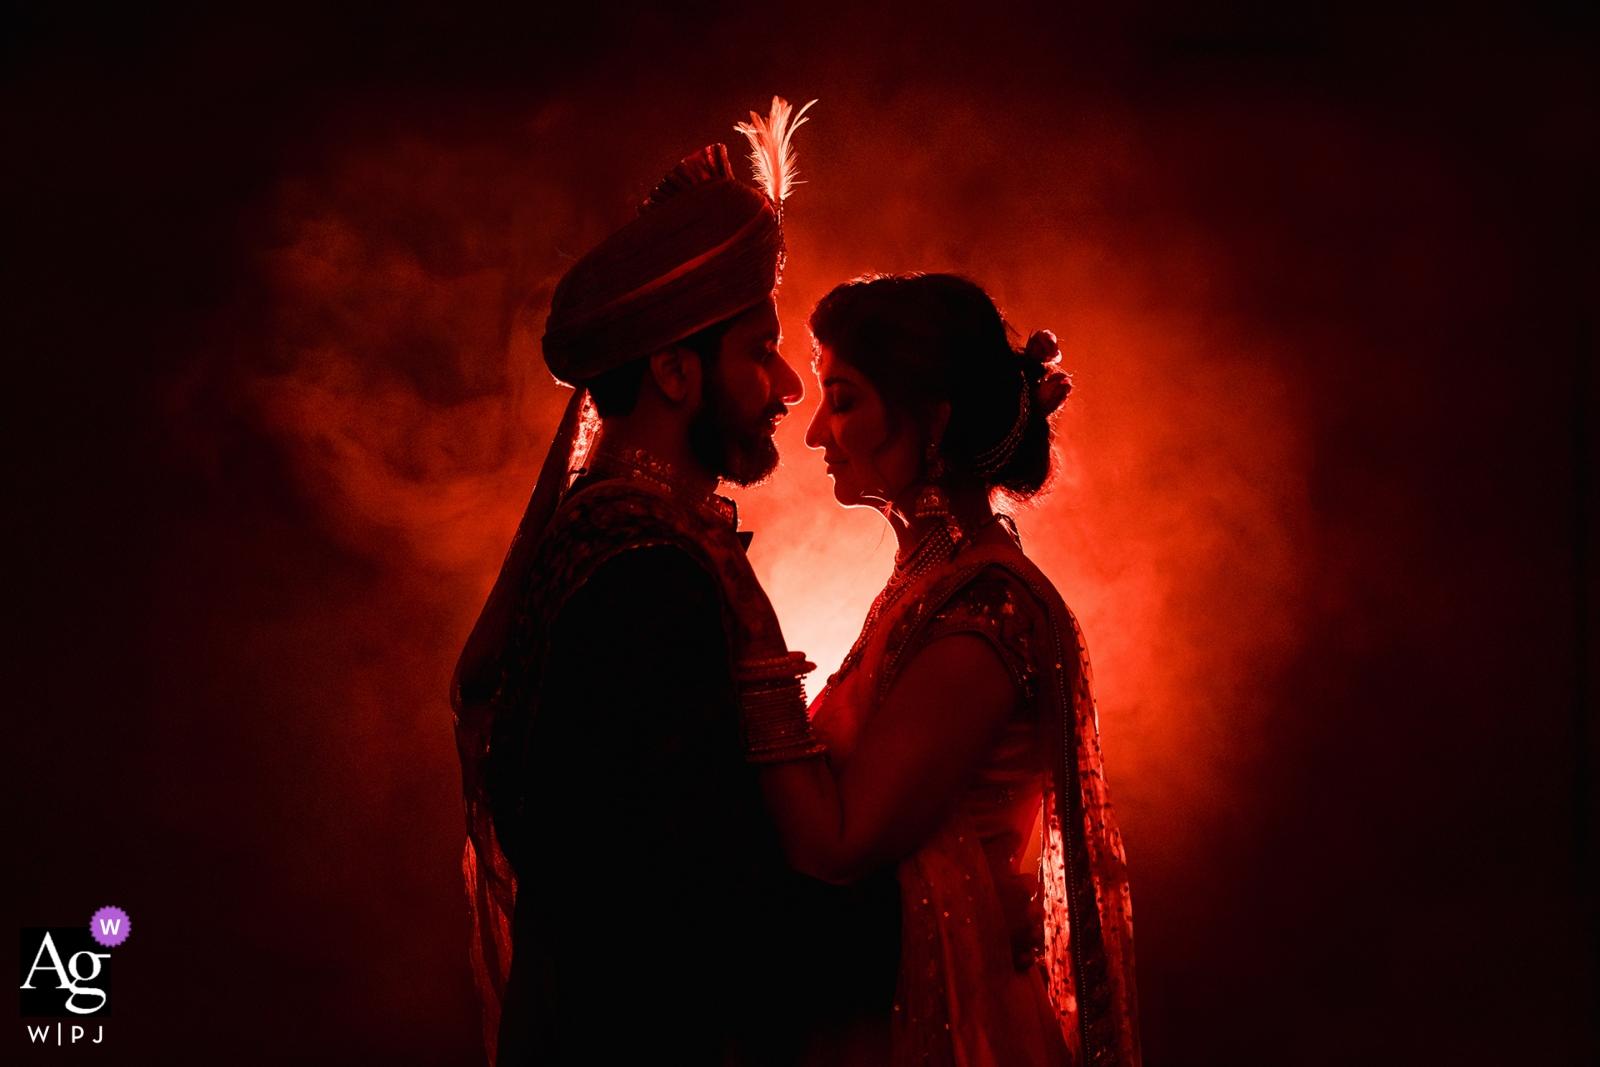 Kristina Cazares Neri is an artistic wedding photographer for California